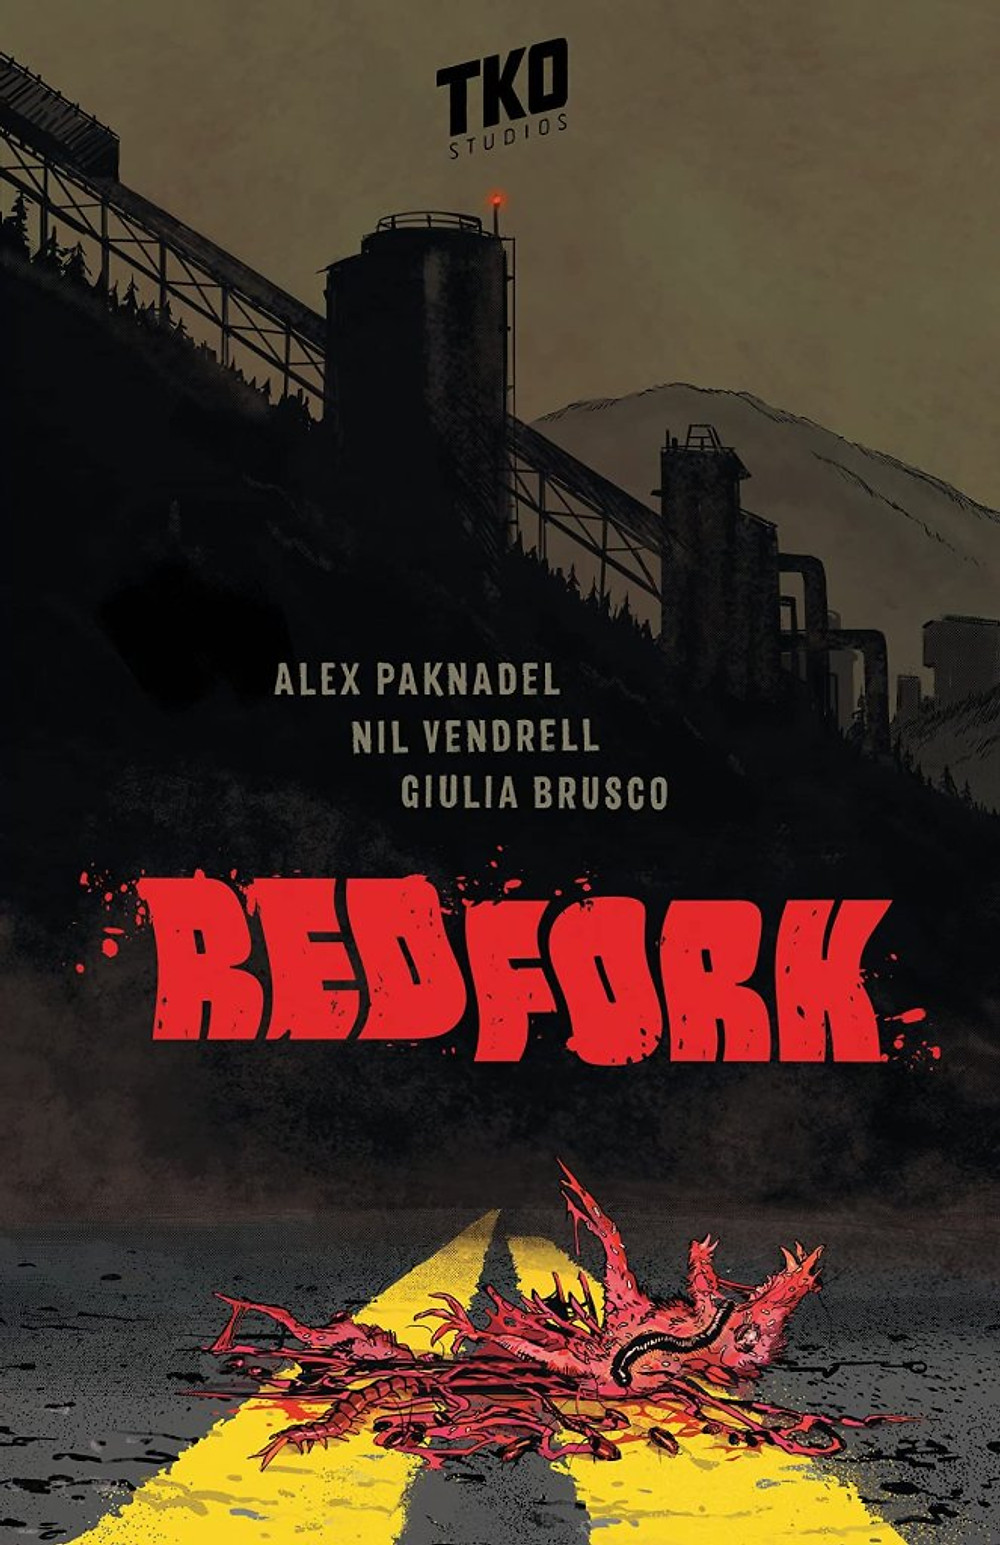 REDFORK(TKO)